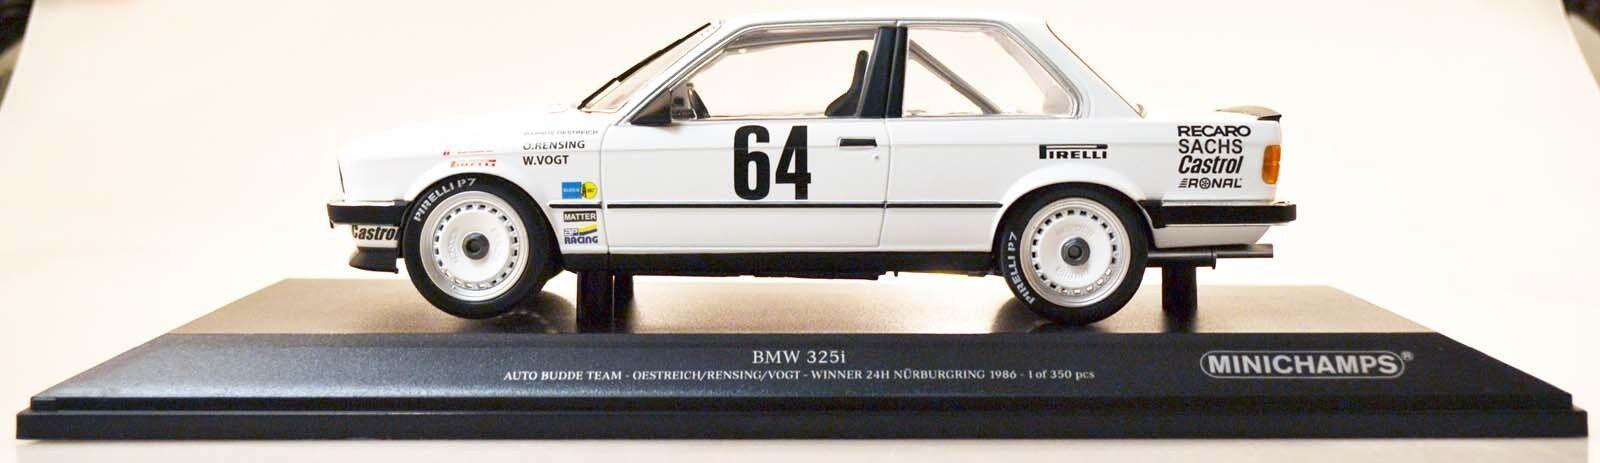 Minichamps 155862664 bmw 325i Budde Oestrich Rensing nurburgring 86 1 18 nuevo en el embalaje original